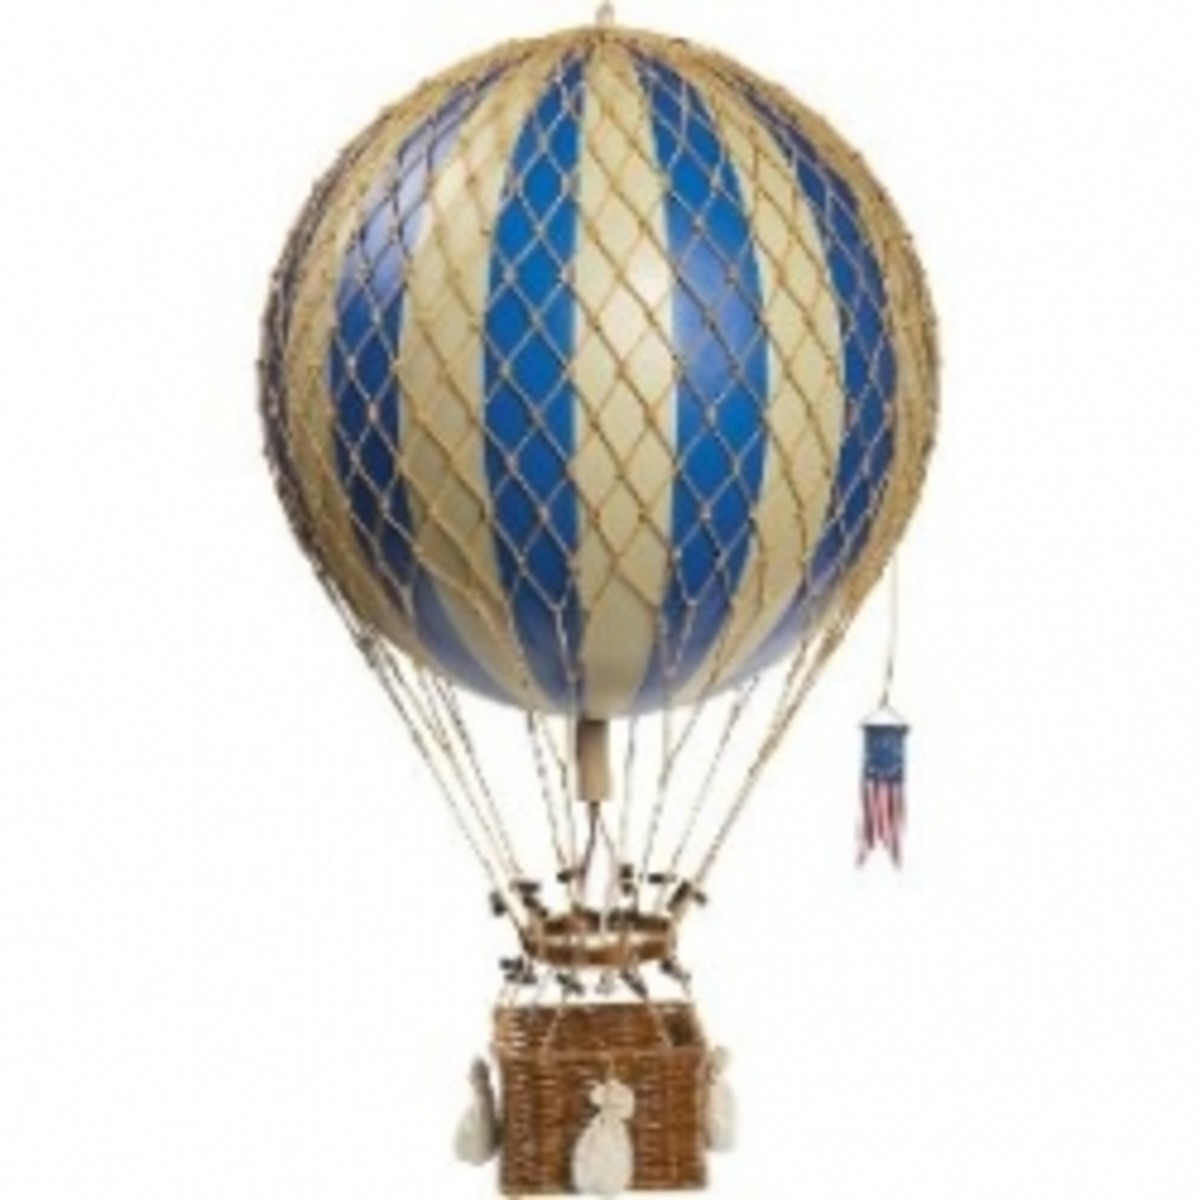 Royal Aero Model Balloon, Blue, Large